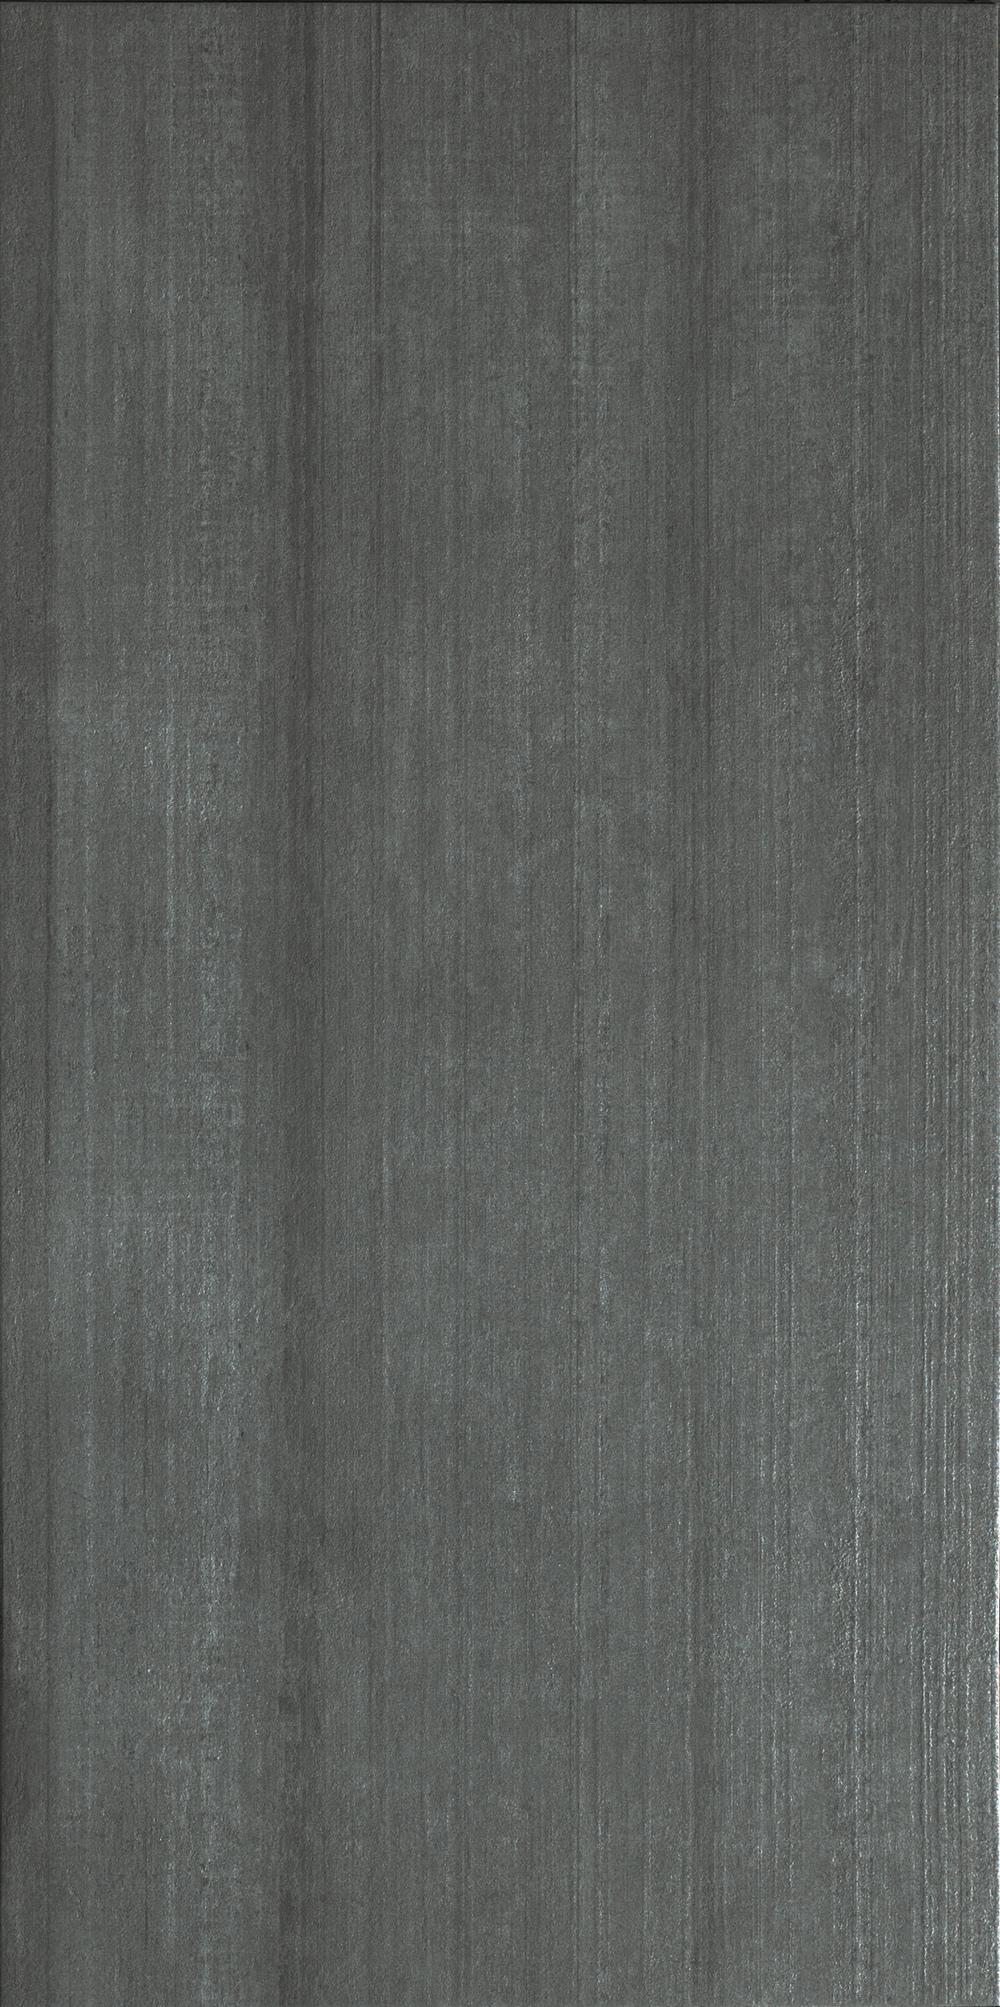 CEMAN1224C – Antracite Cassero